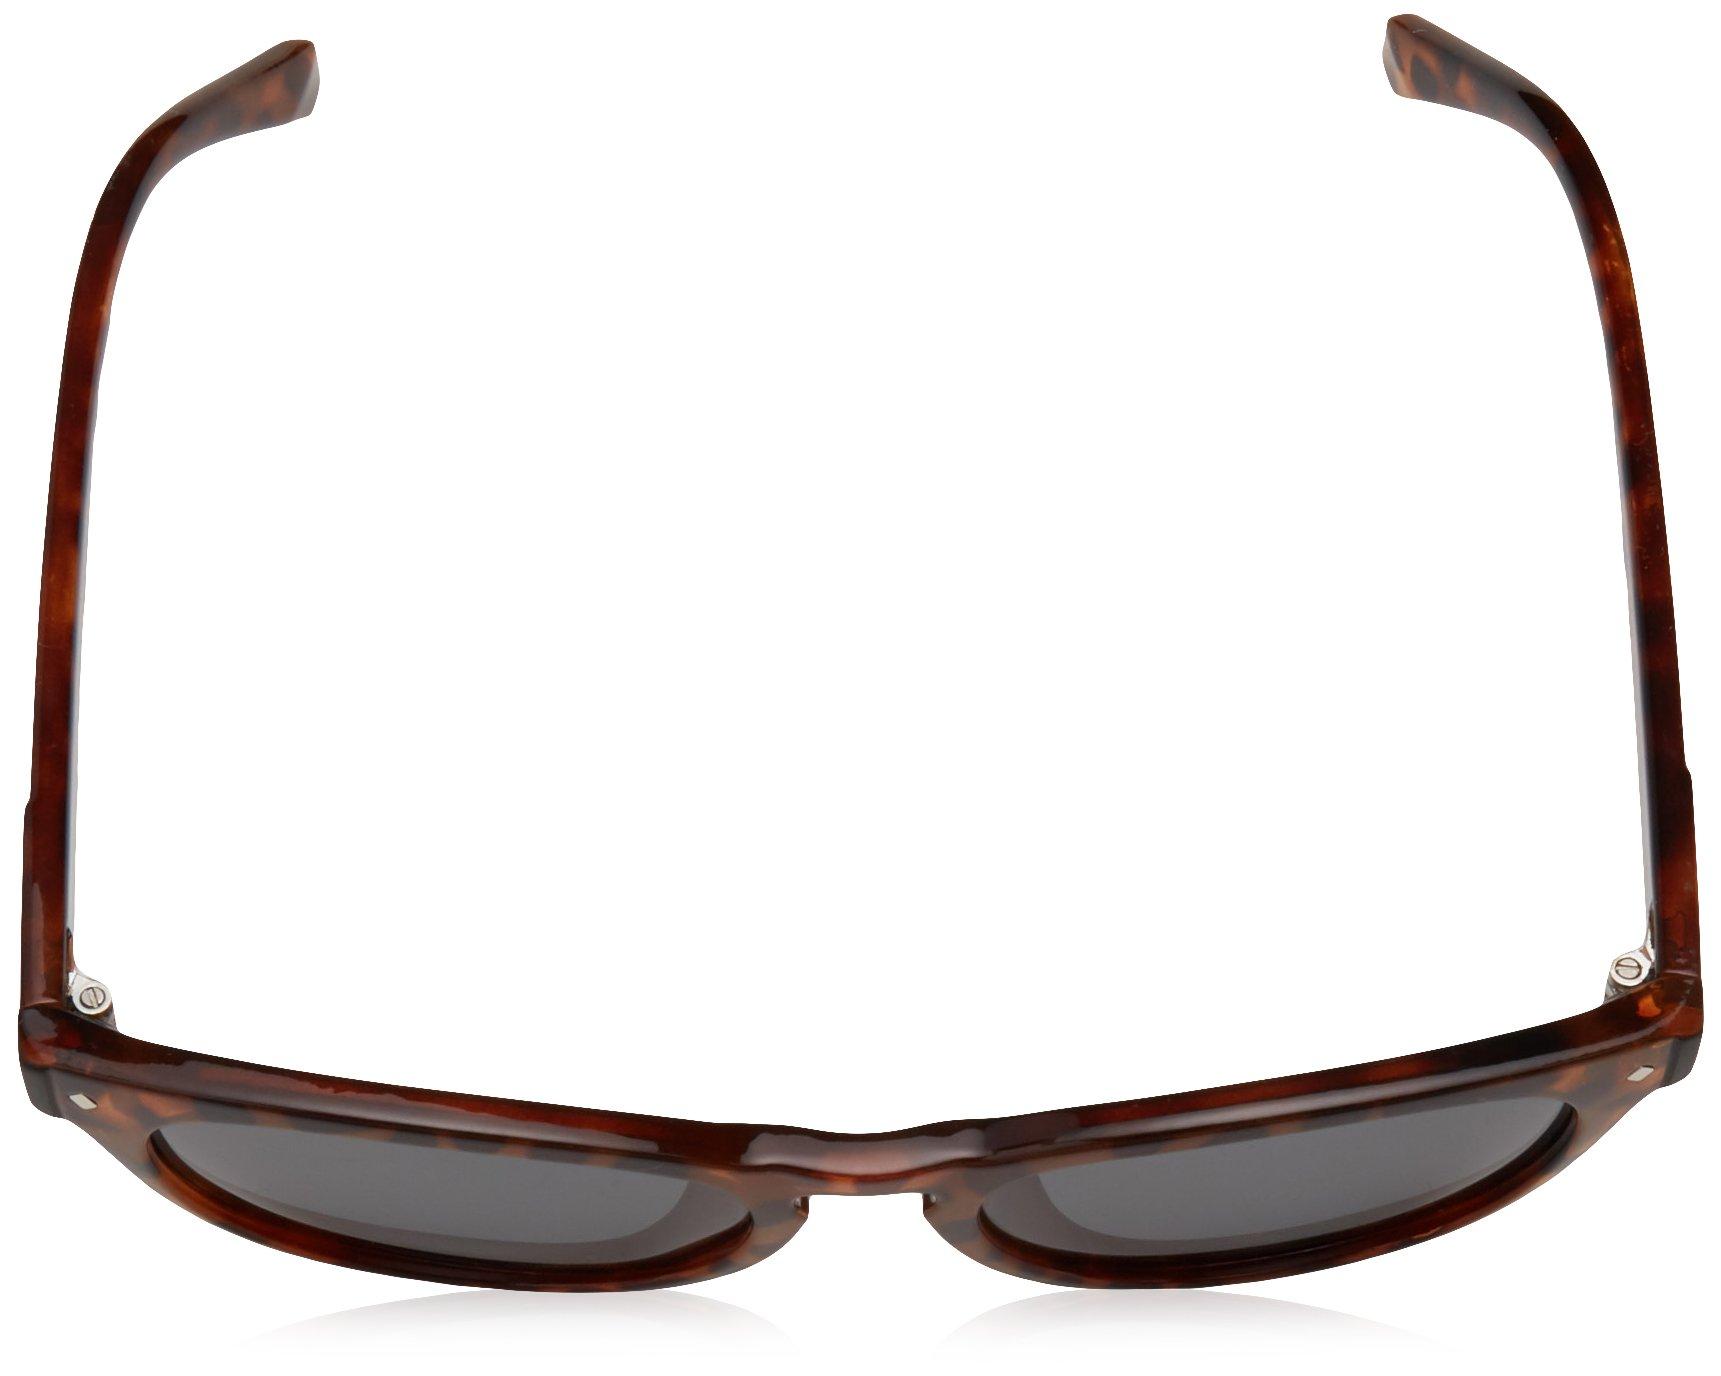 Polaroid Sunglasses Girls' Pld8026fs Polarized Oval Sunglasses, DKHAVANA, 49 mm by Polaroid Sunglasses (Image #4)